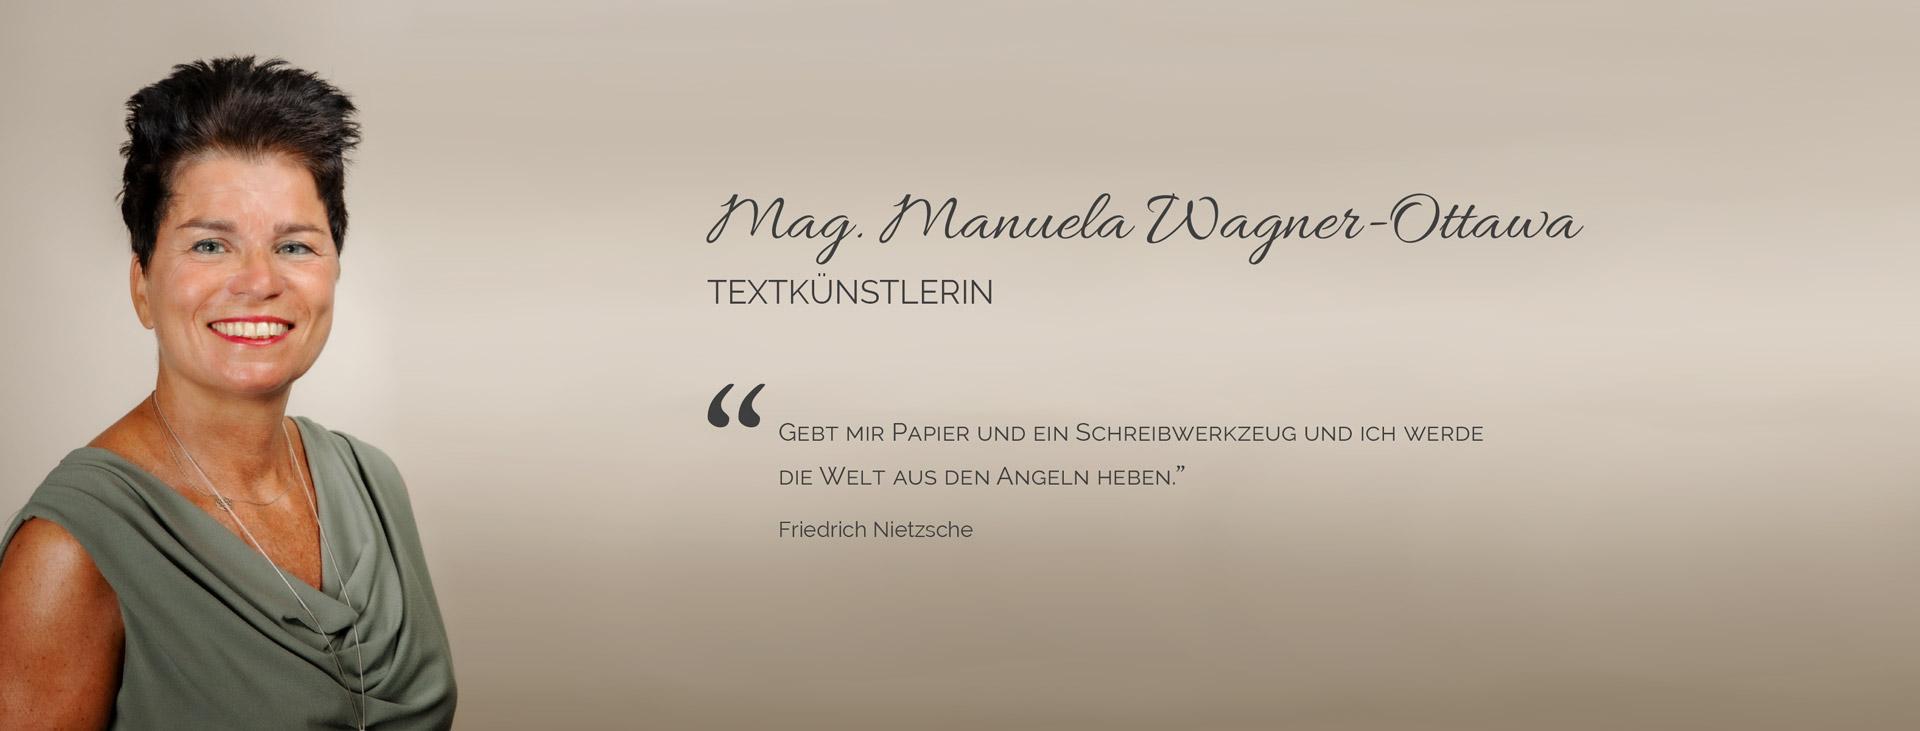 Manuela-Wagner-Ottawa-Texterin